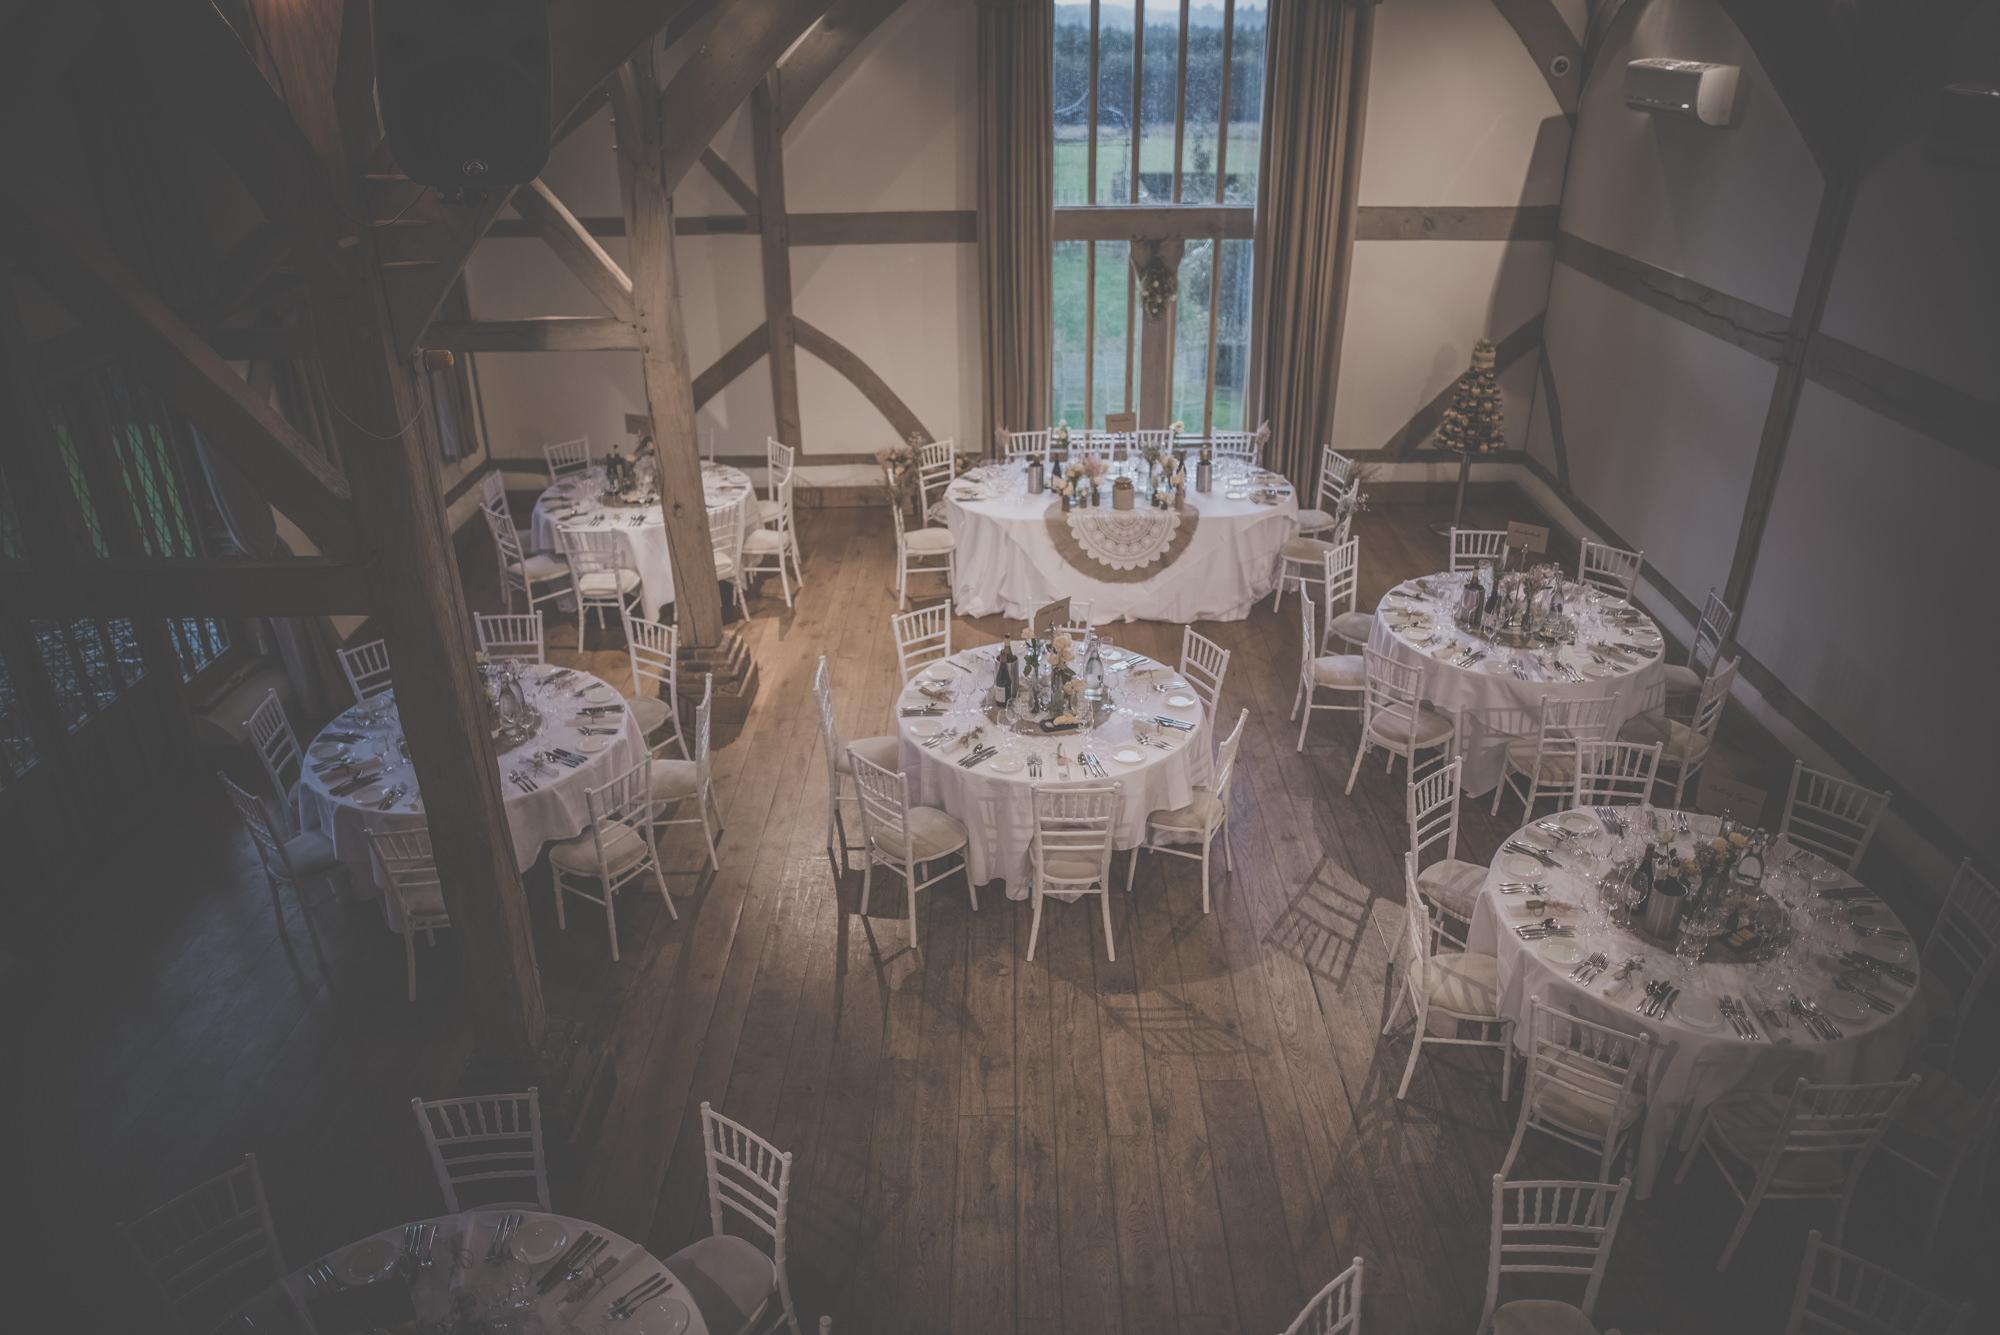 Charisse-and-James-wedding-in-Cain-Manor-Venue-Hampshire-Manu-Mendoza-Wedding-Photography-411.jpg